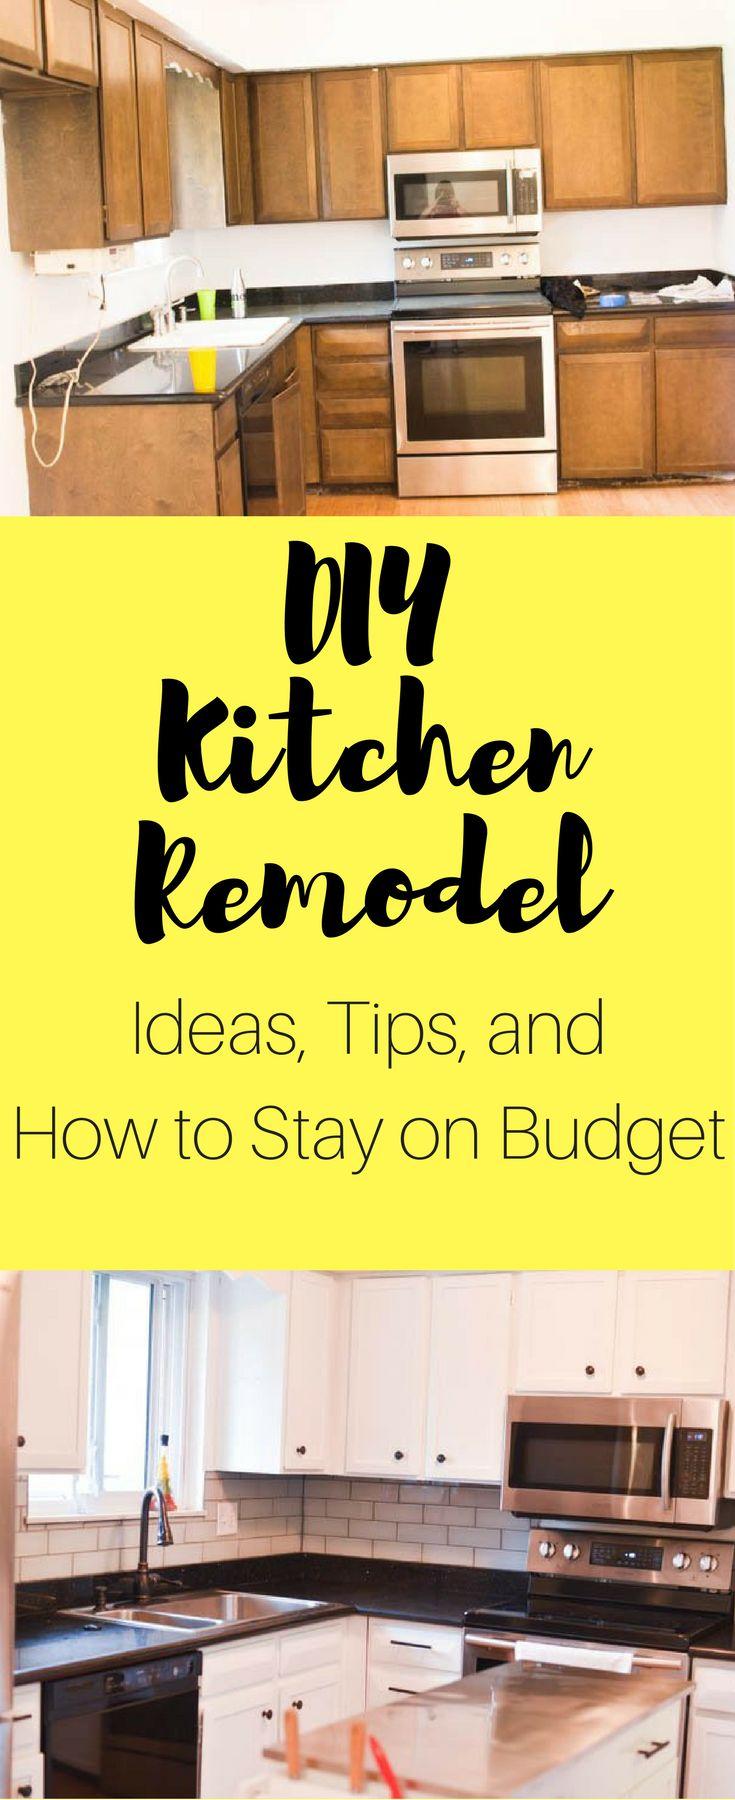 962 best kitchens images on pinterest kitchen ideas kitchen and